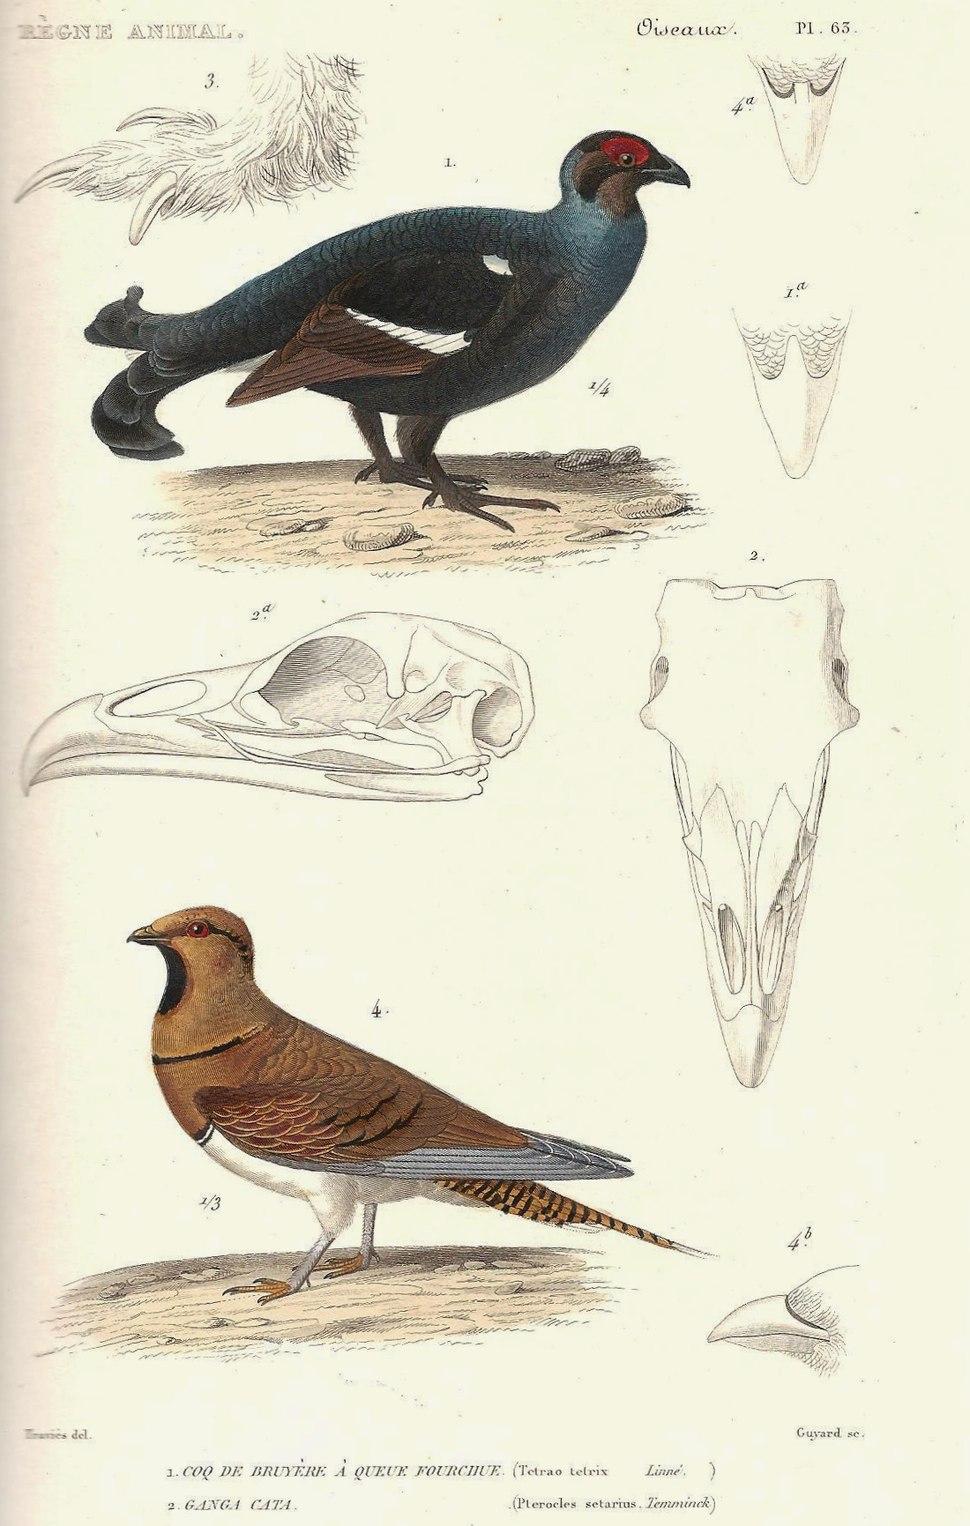 Cuvier-63-Coq de bruyère et Ganga cata